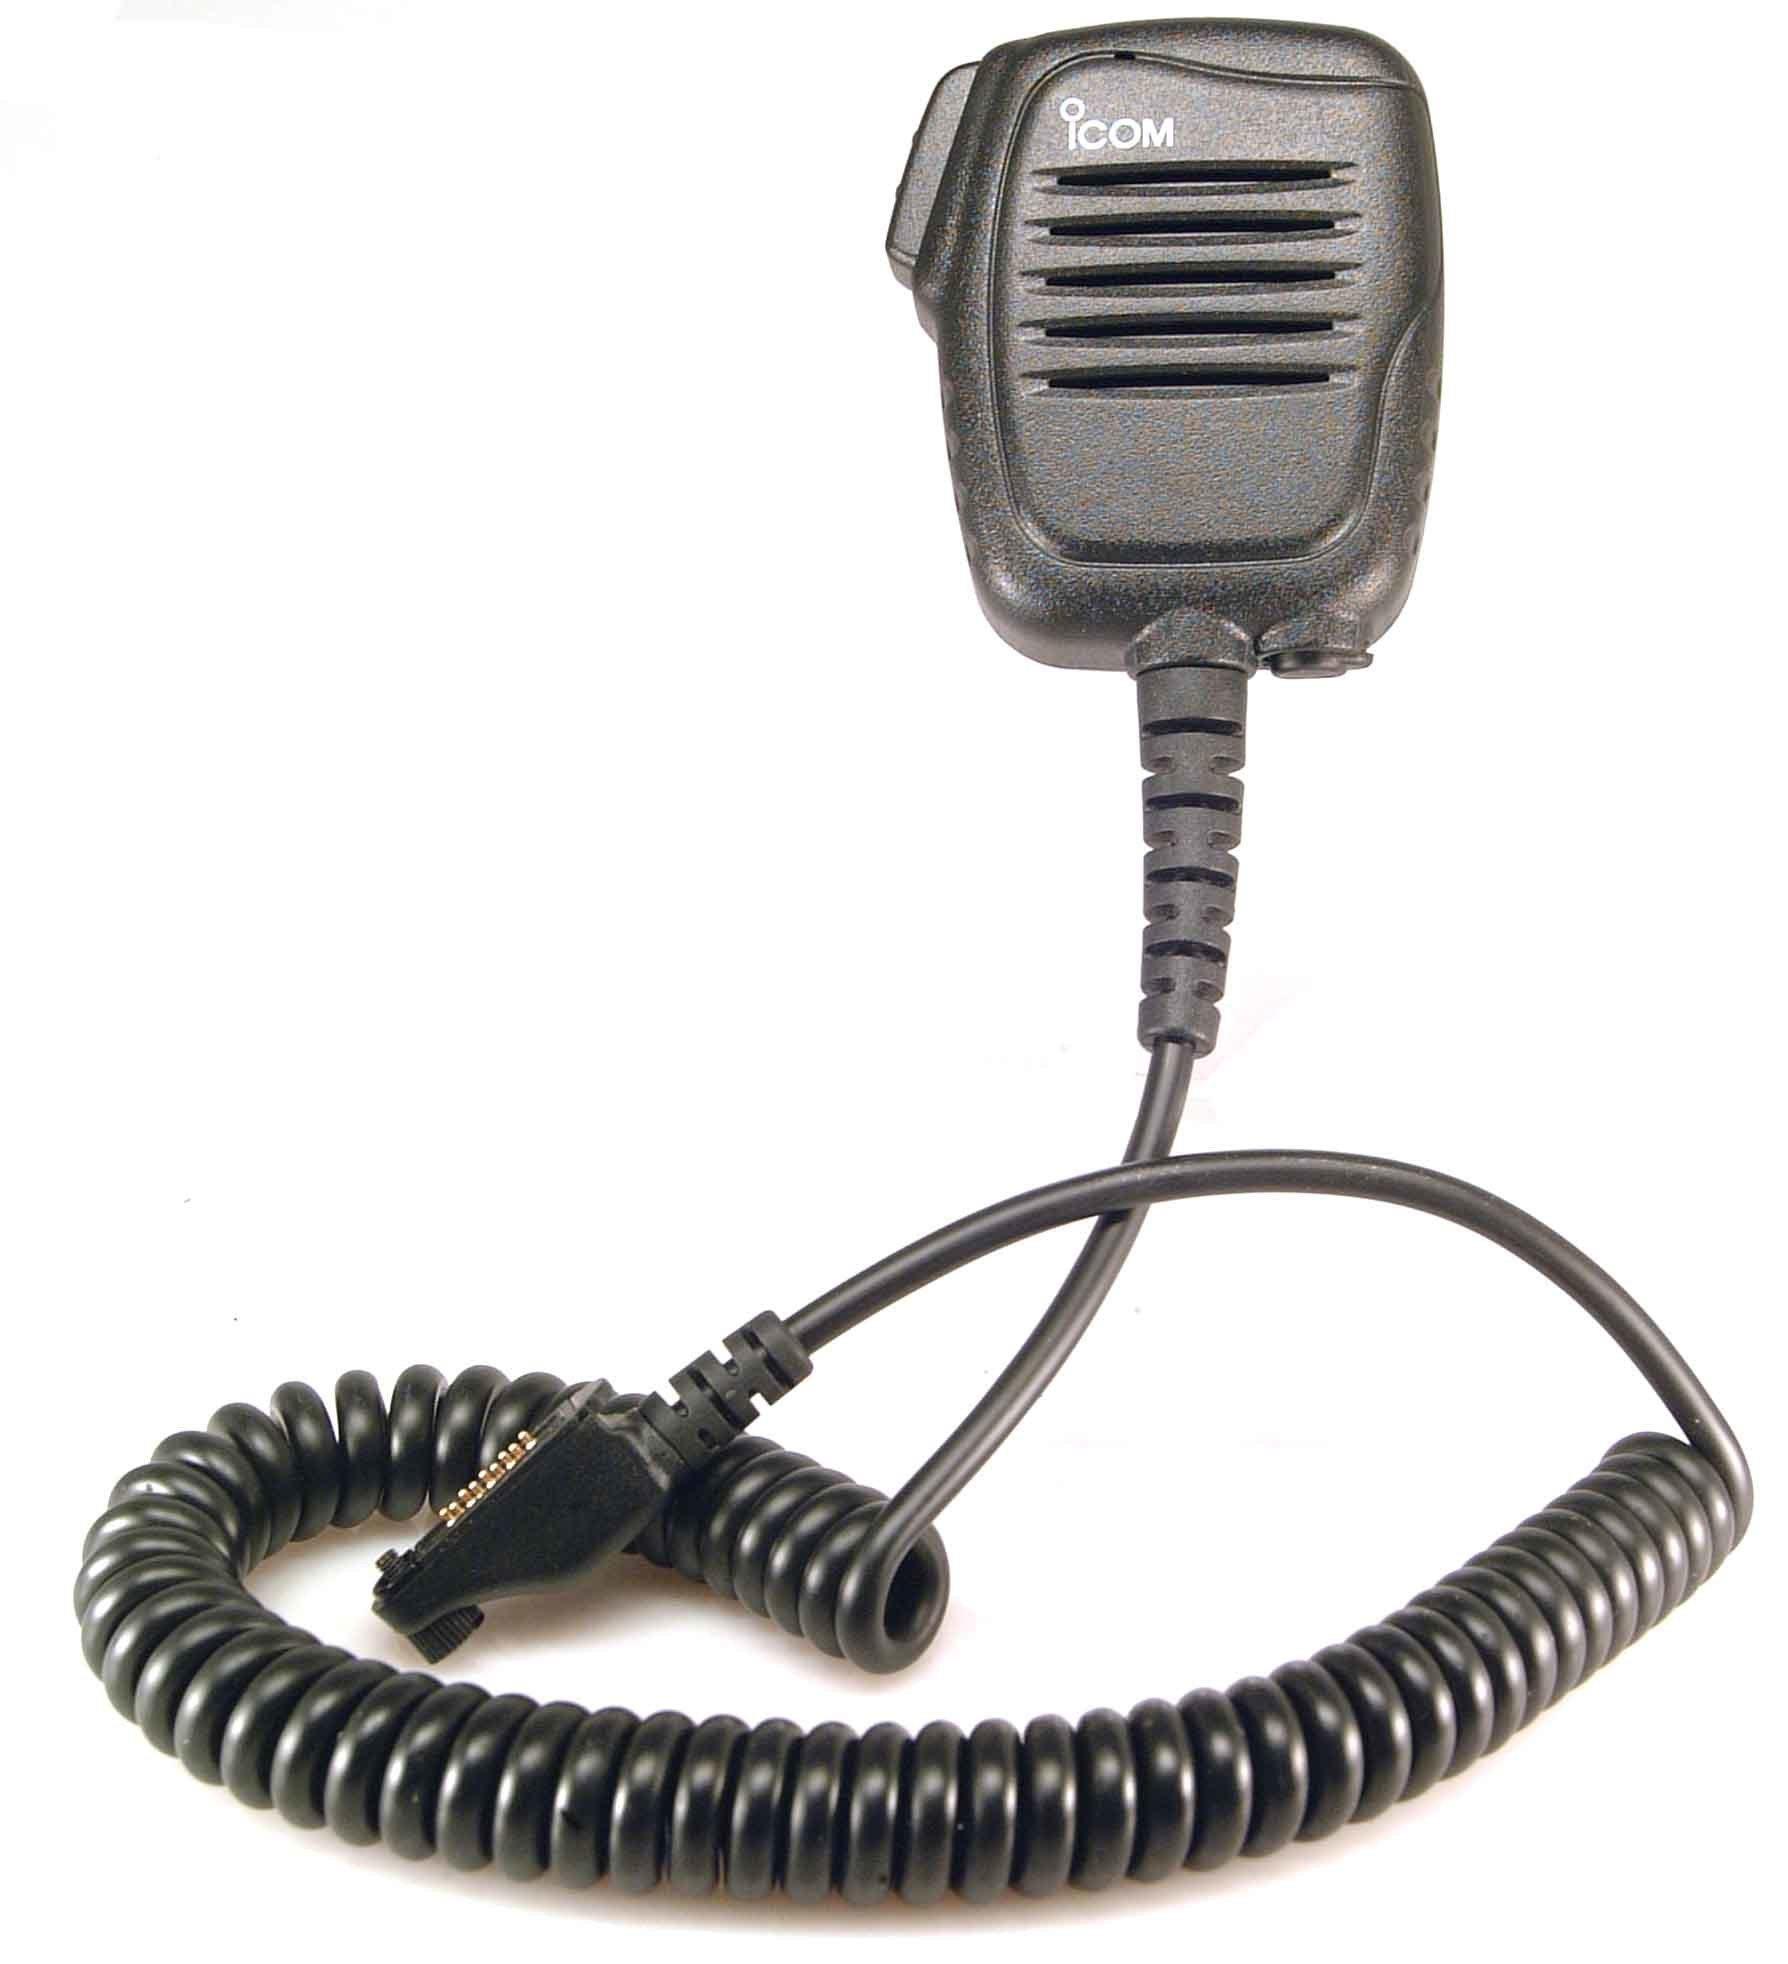 Icom HM-159SCLG low gain speaker-microphone 345